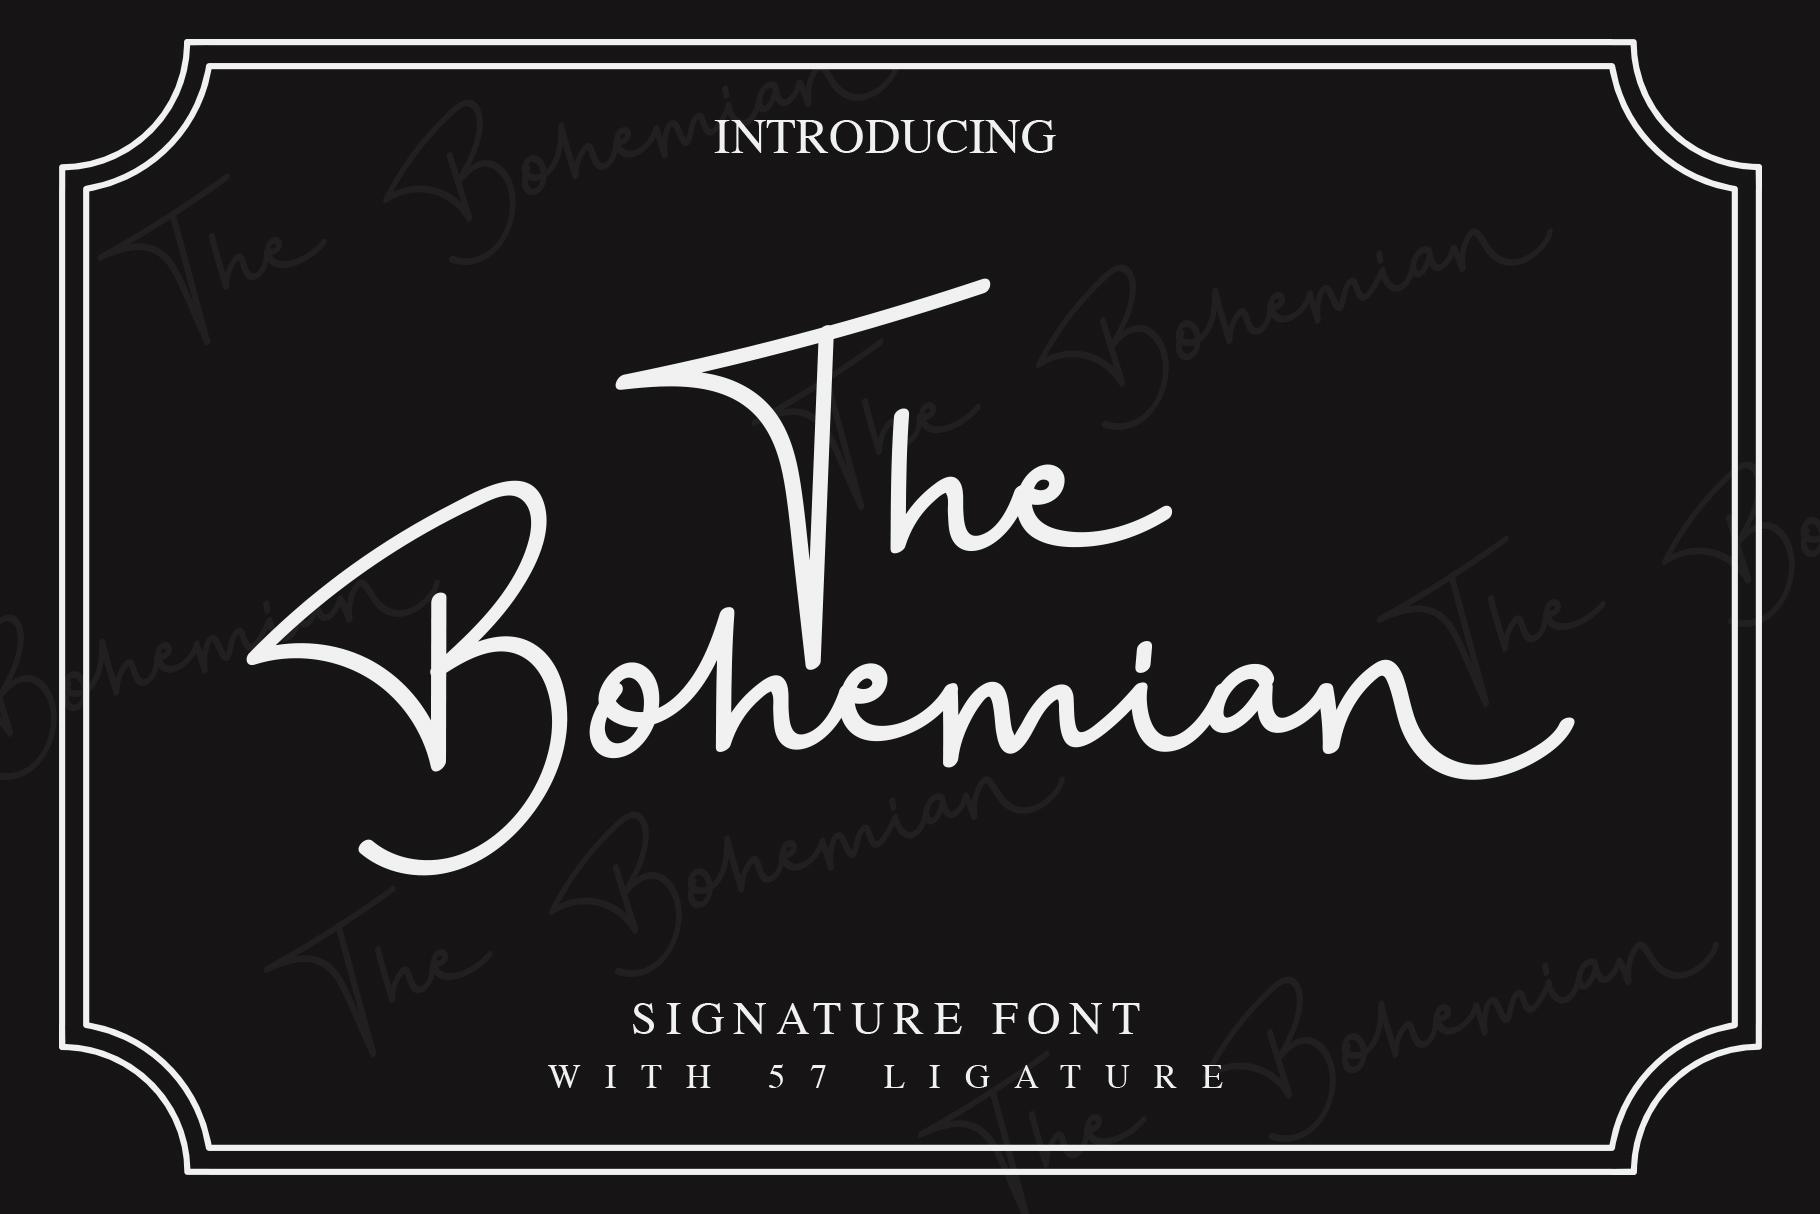 Bohemian手写连笔签名艺术字体下载